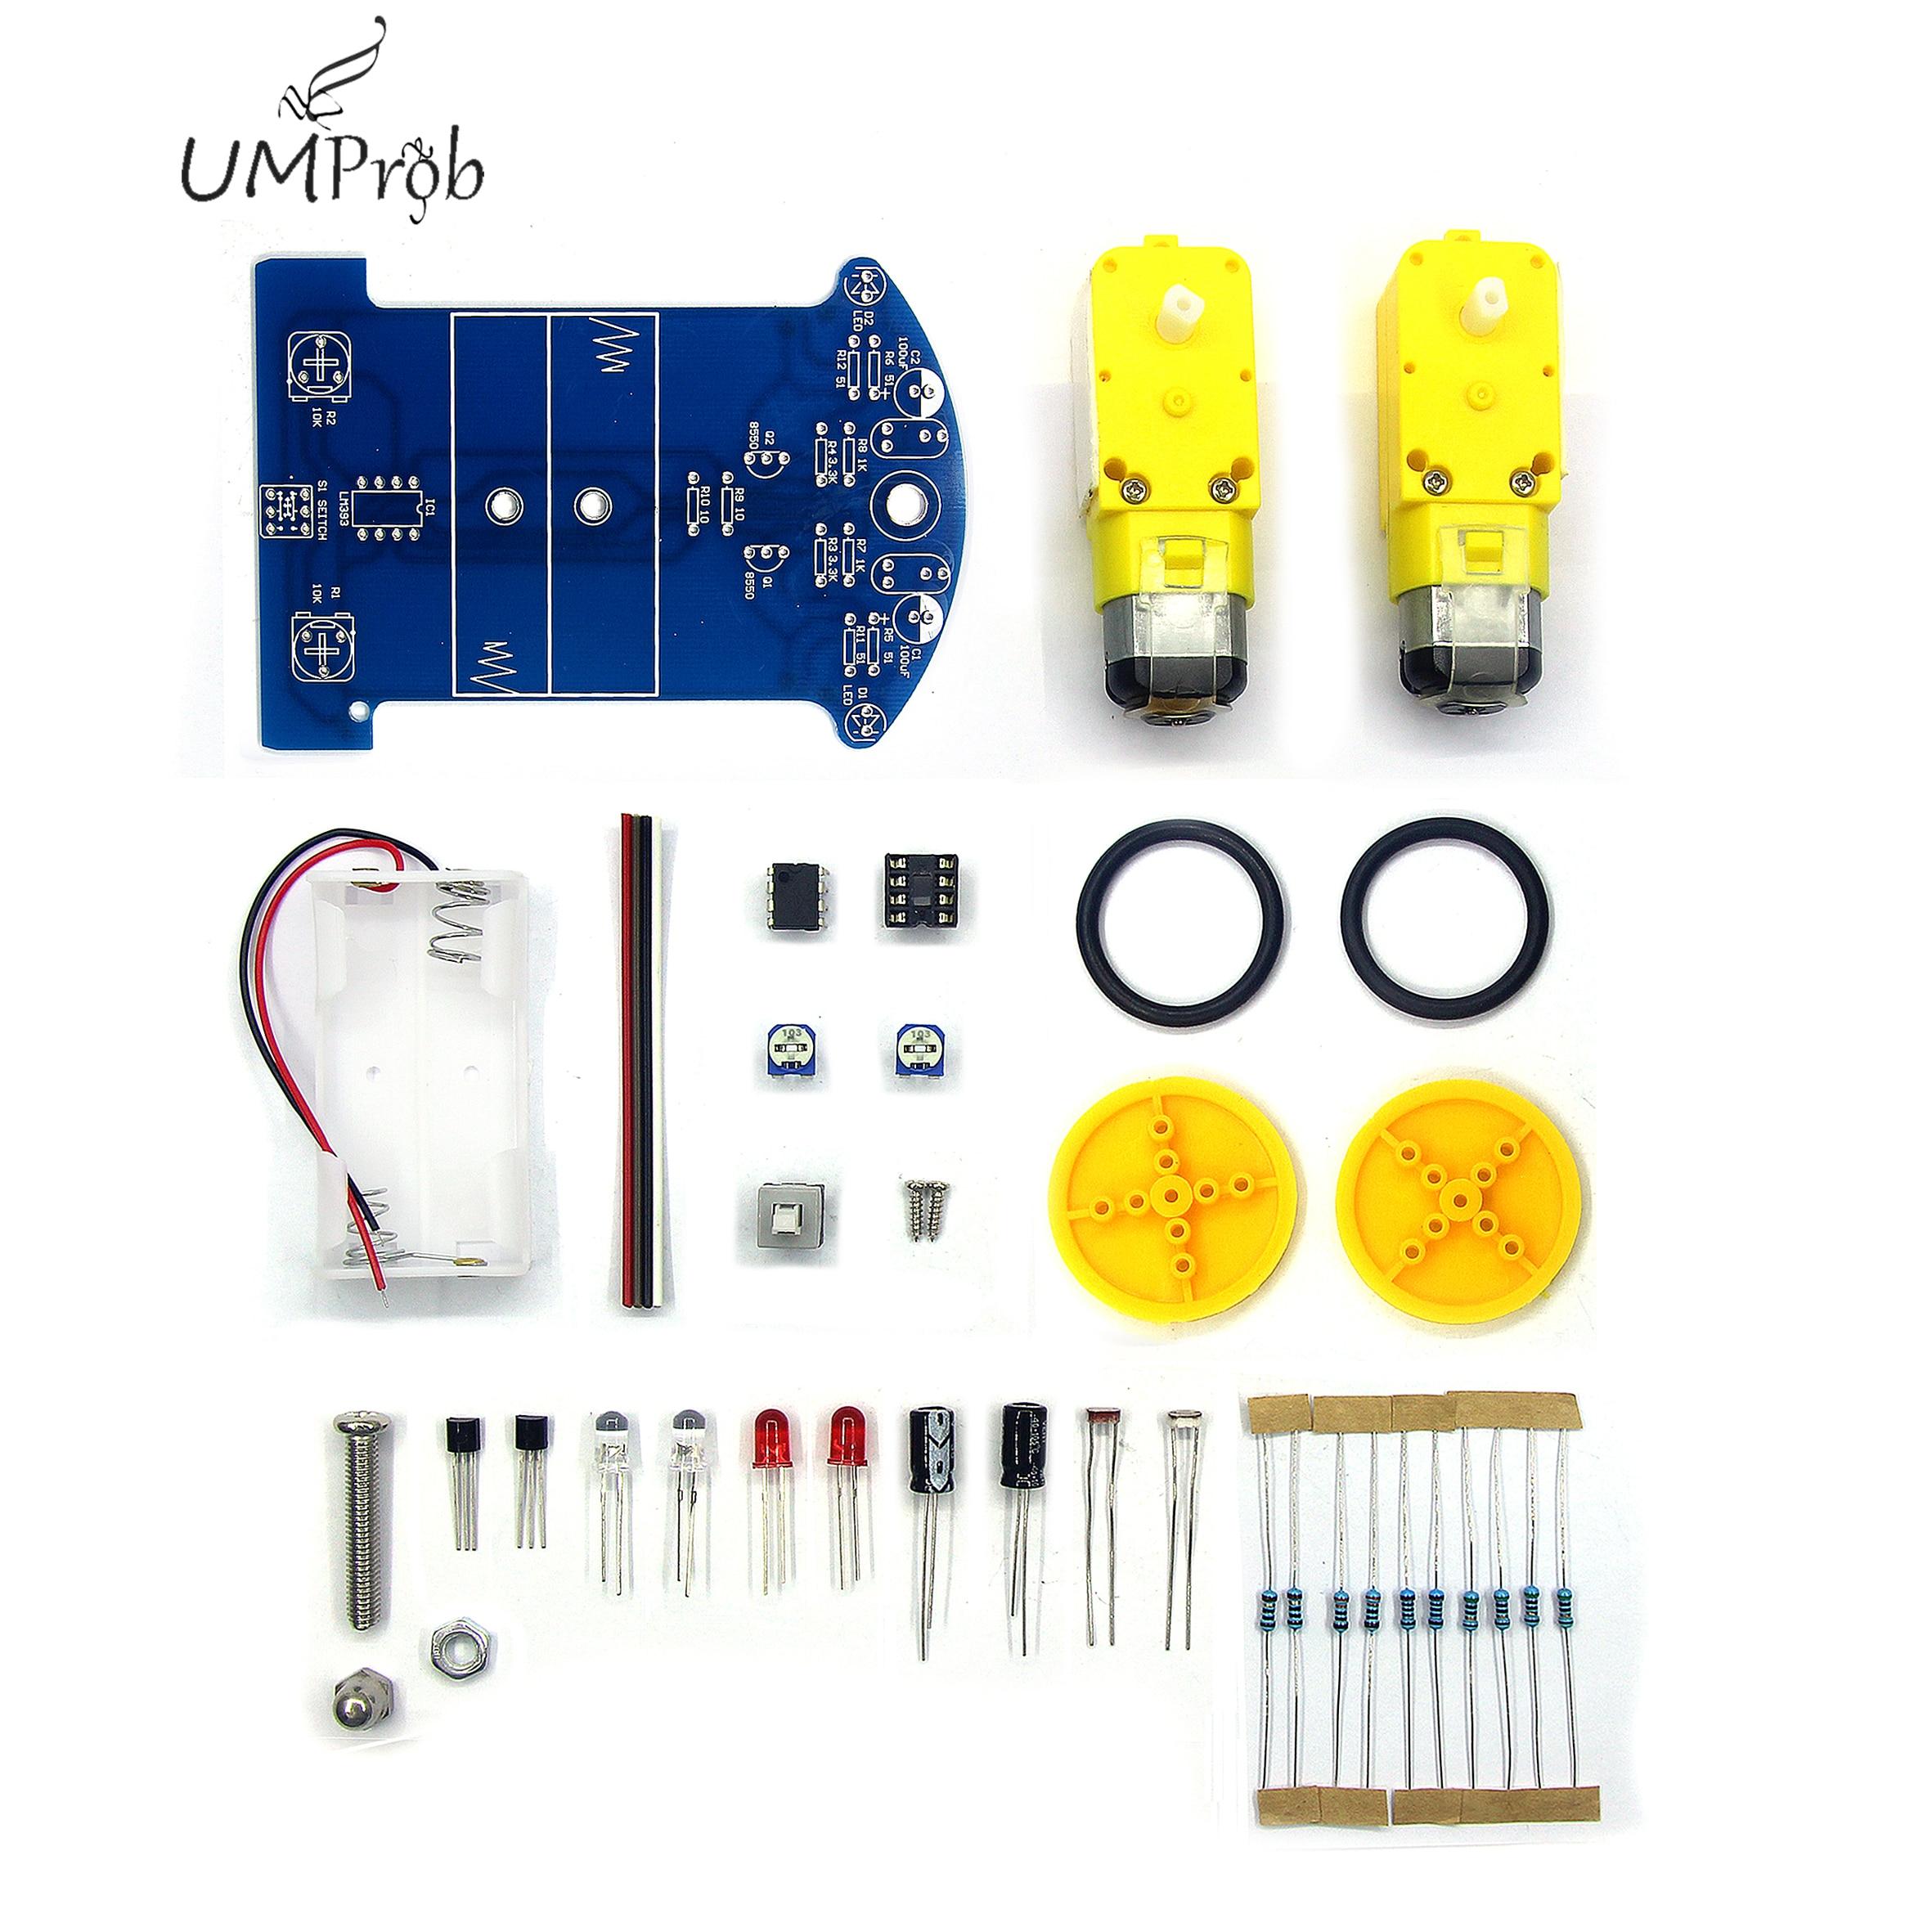 D2-1 DIY Kit Intelligent Tracking Line Smart Car Kit TT Motor Electronic DIY Kit Smart Patrol Automobile Parts DIY Electronic